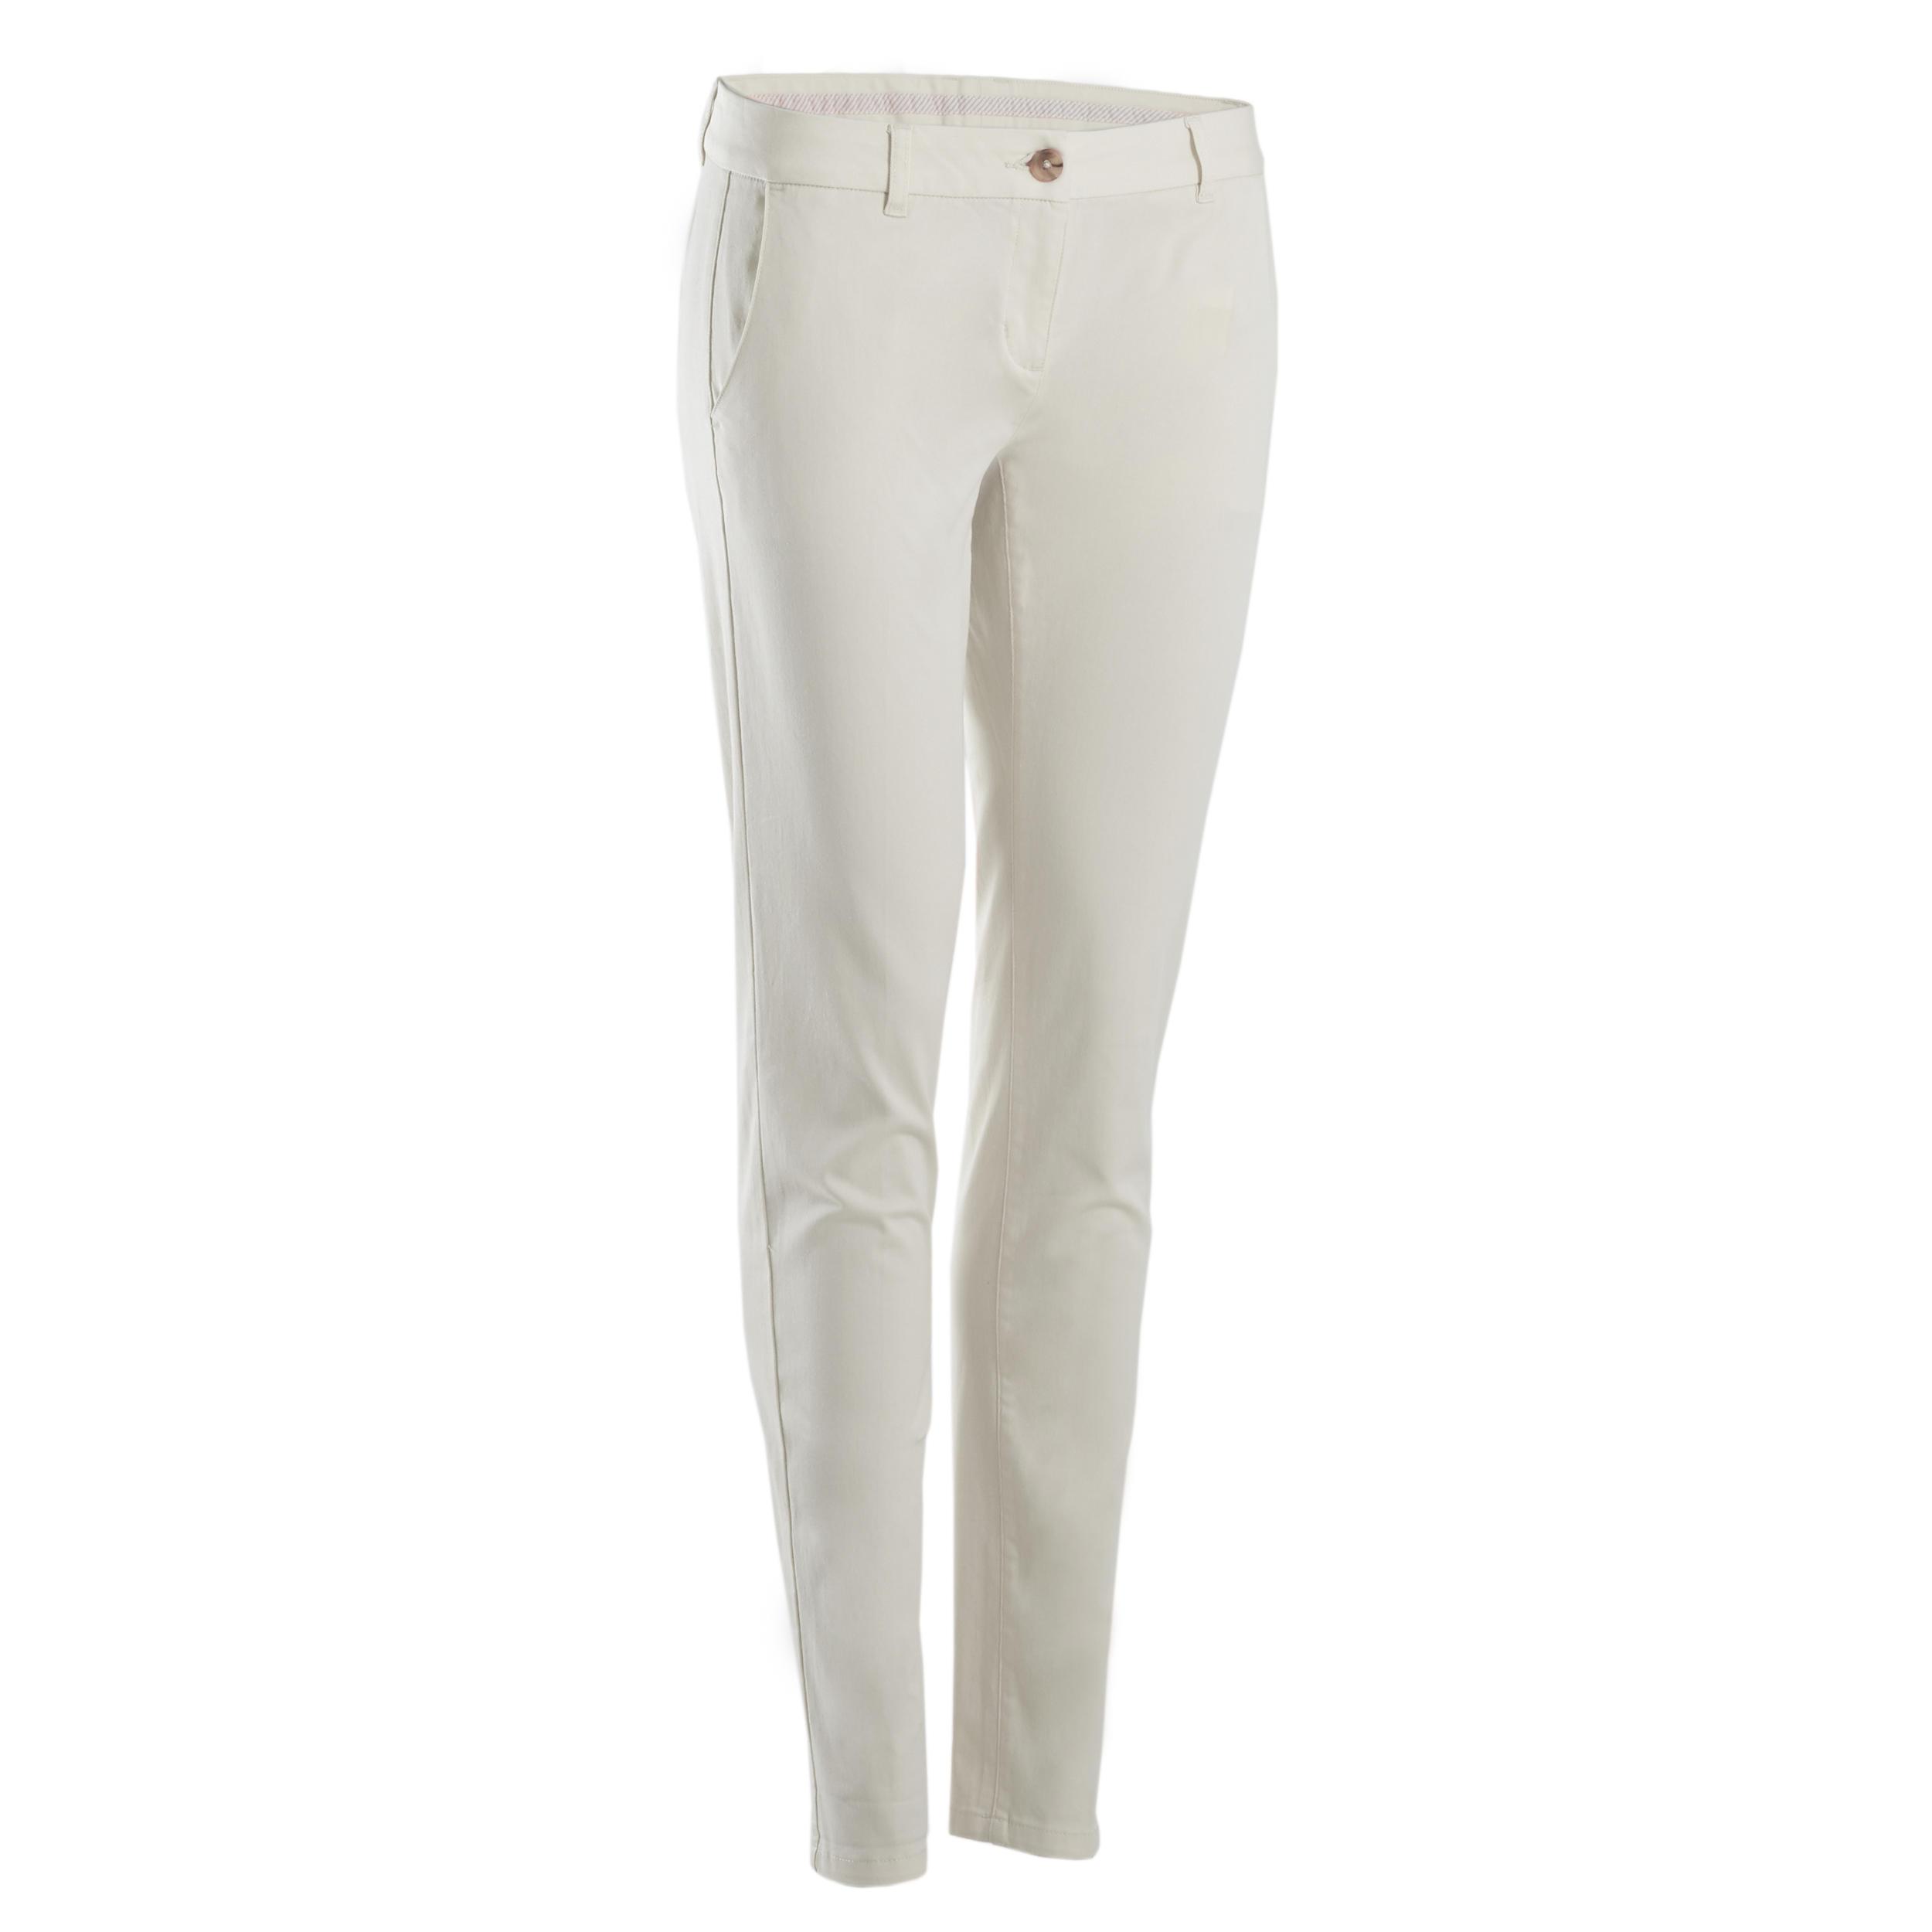 Pantalon Golf Bej Damă imagine produs